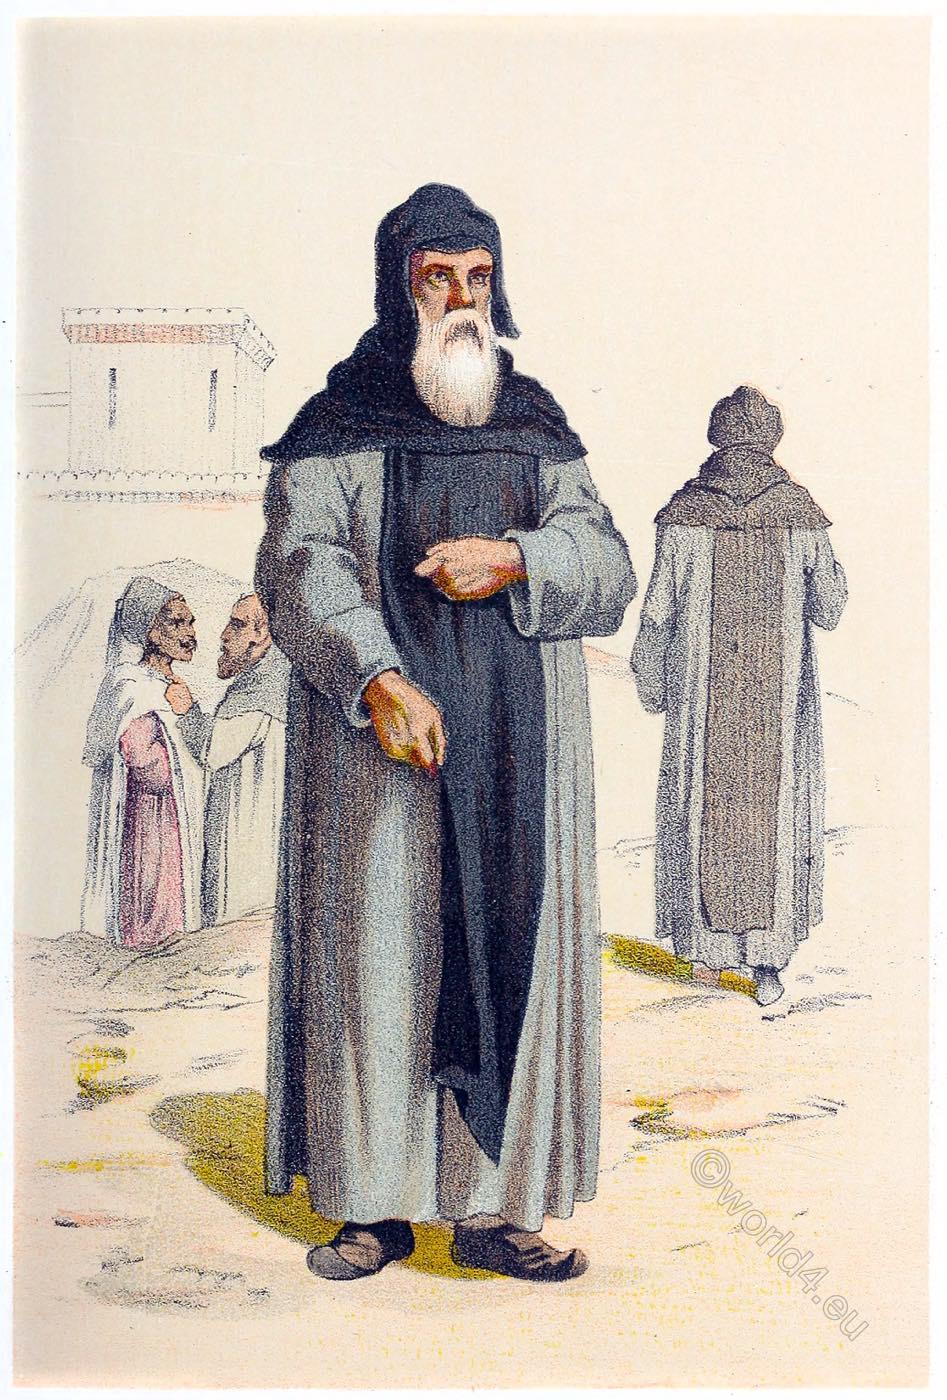 Coptic, Monks, habit, Order, Basilian, basil,